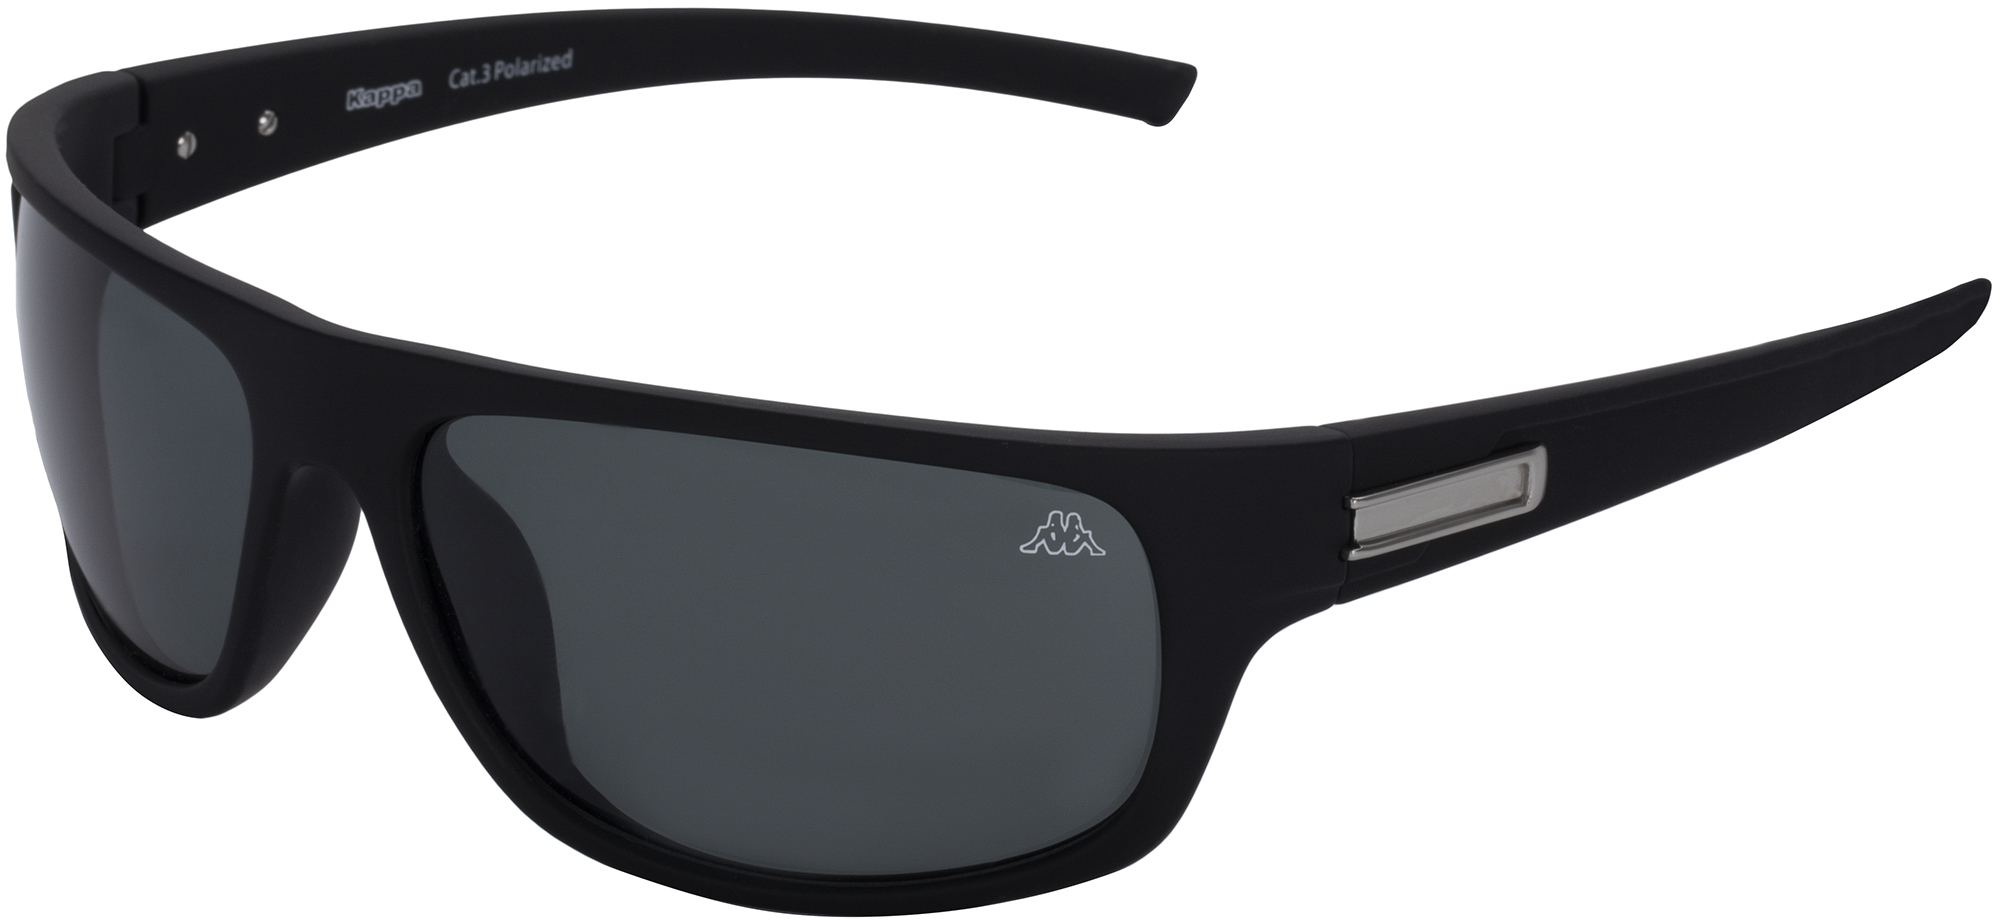 купить Kappa Солнцезащитные очки Kappa онлайн